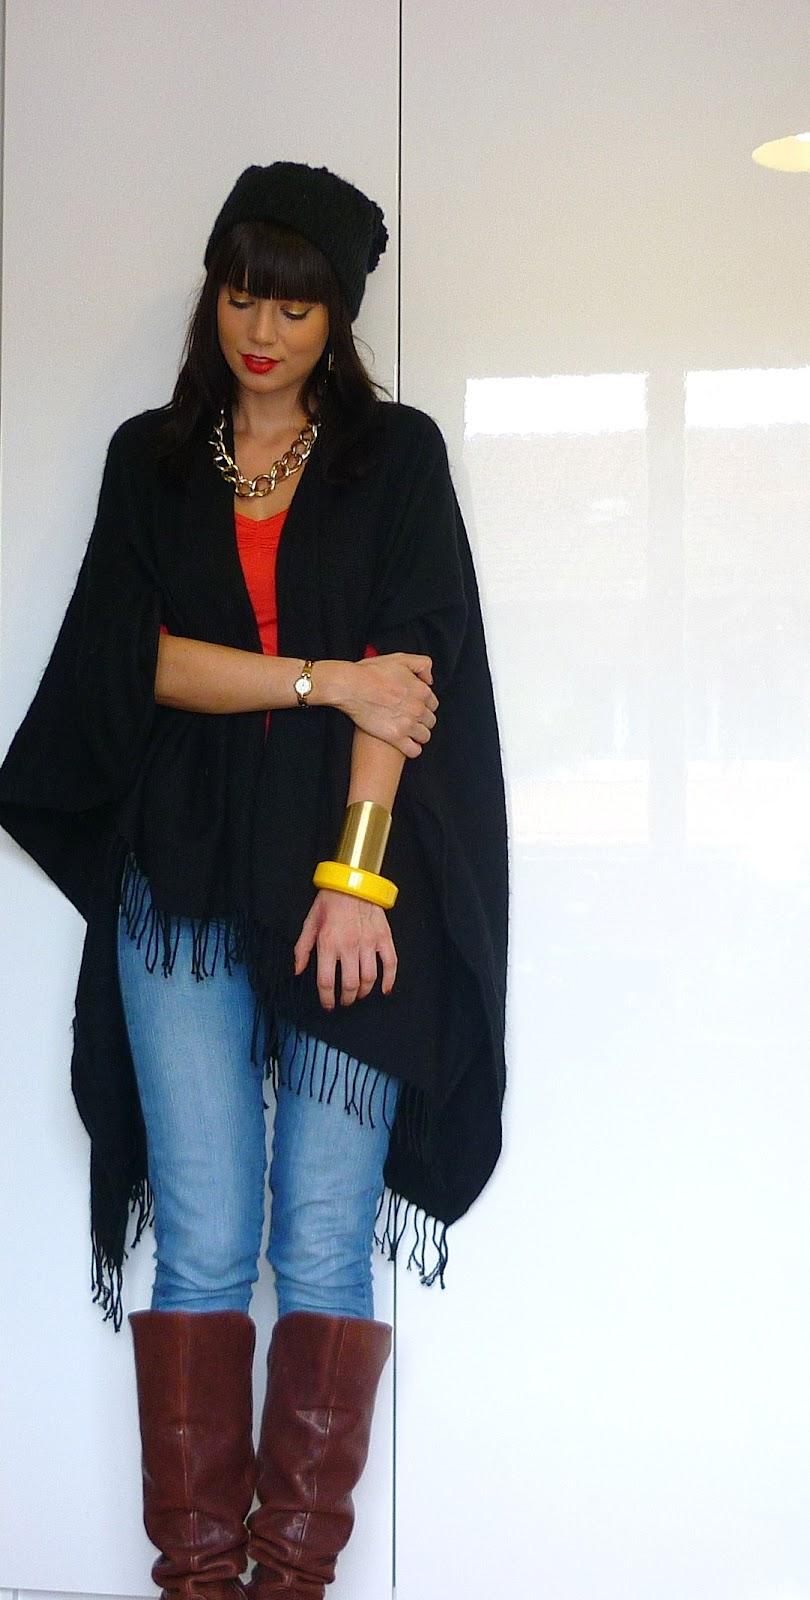 Pishis Colors: OOTD: Black Poncho goes Gangsta Style